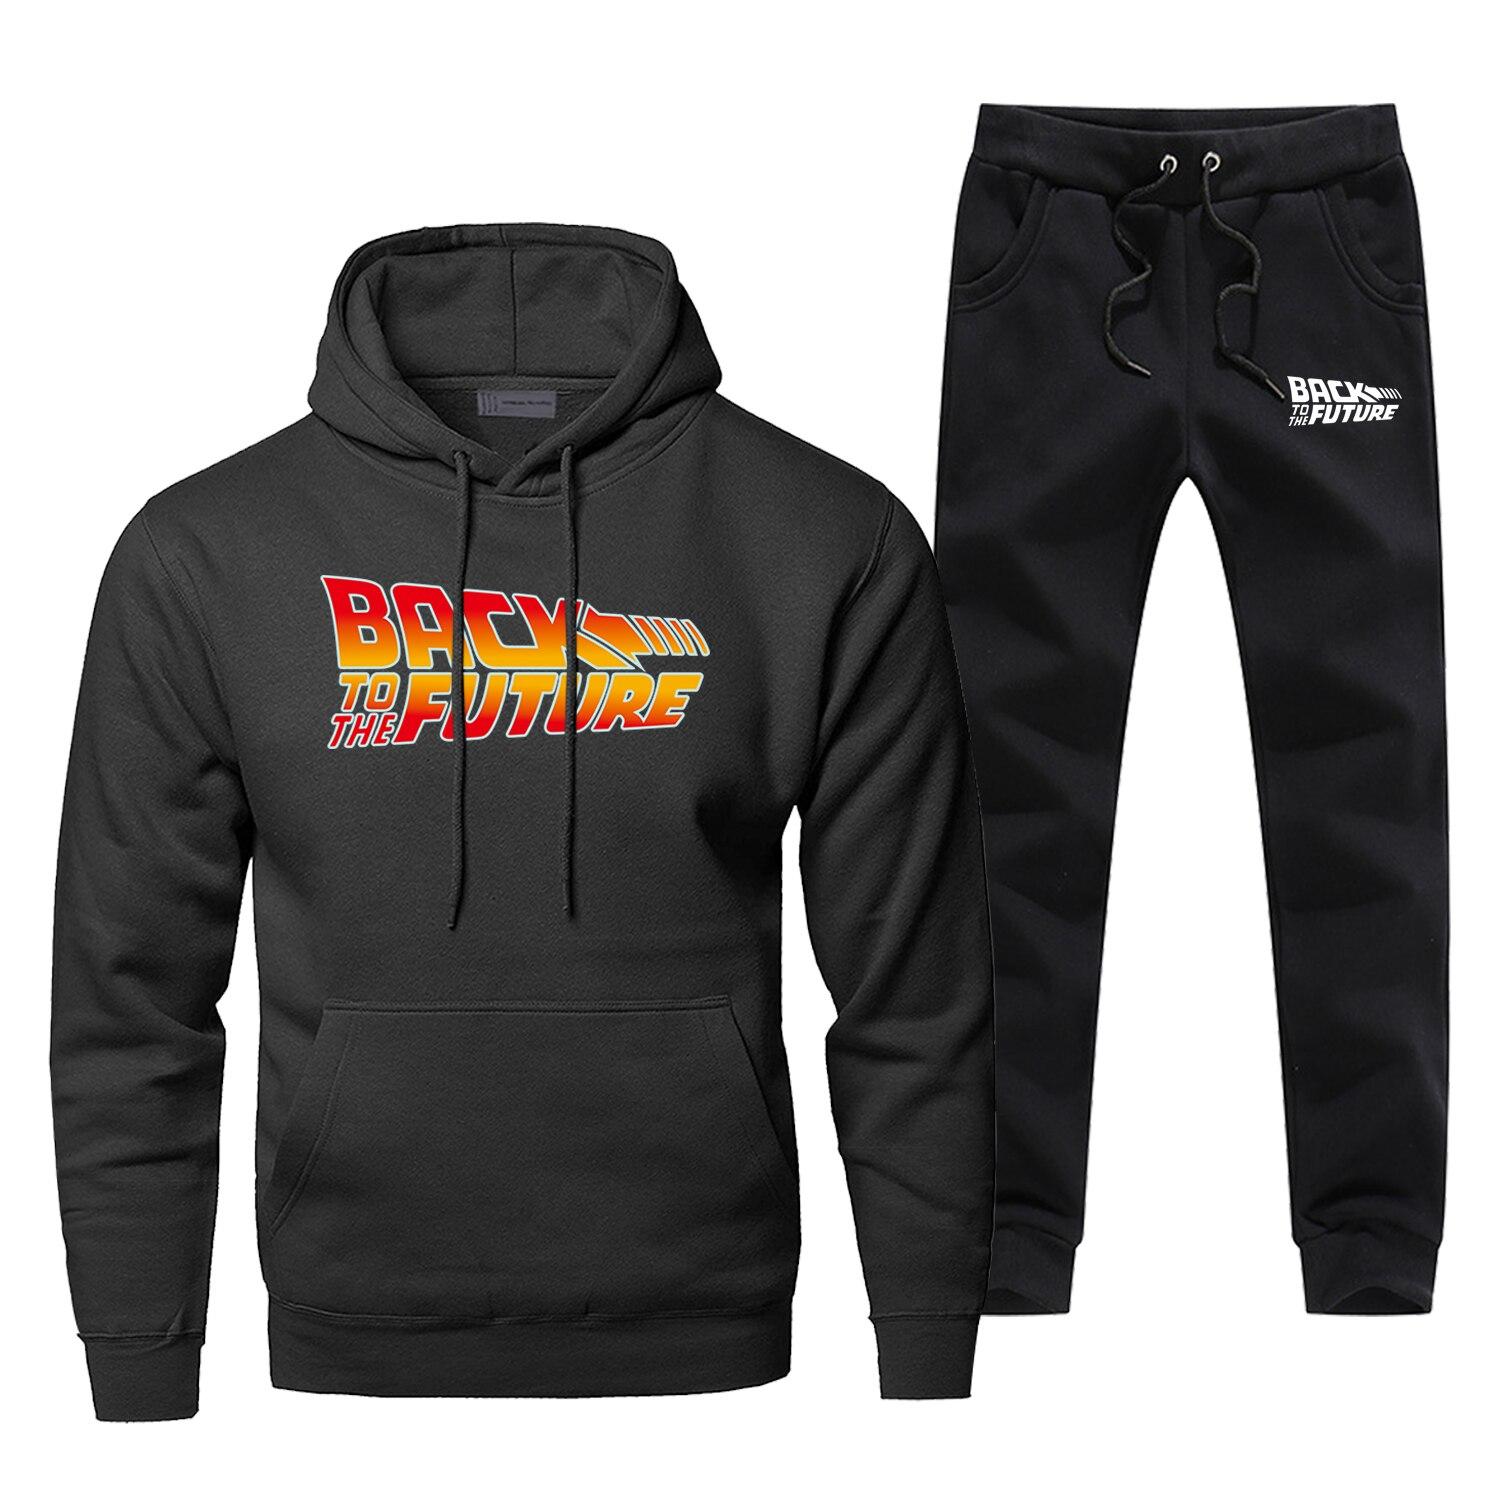 Back To The Future Hoodies Pants Sets Men Track Suit 2 Piece Tops Pant Sweatshirt Sweatpants Sportswear Movie Autumn Sports Set